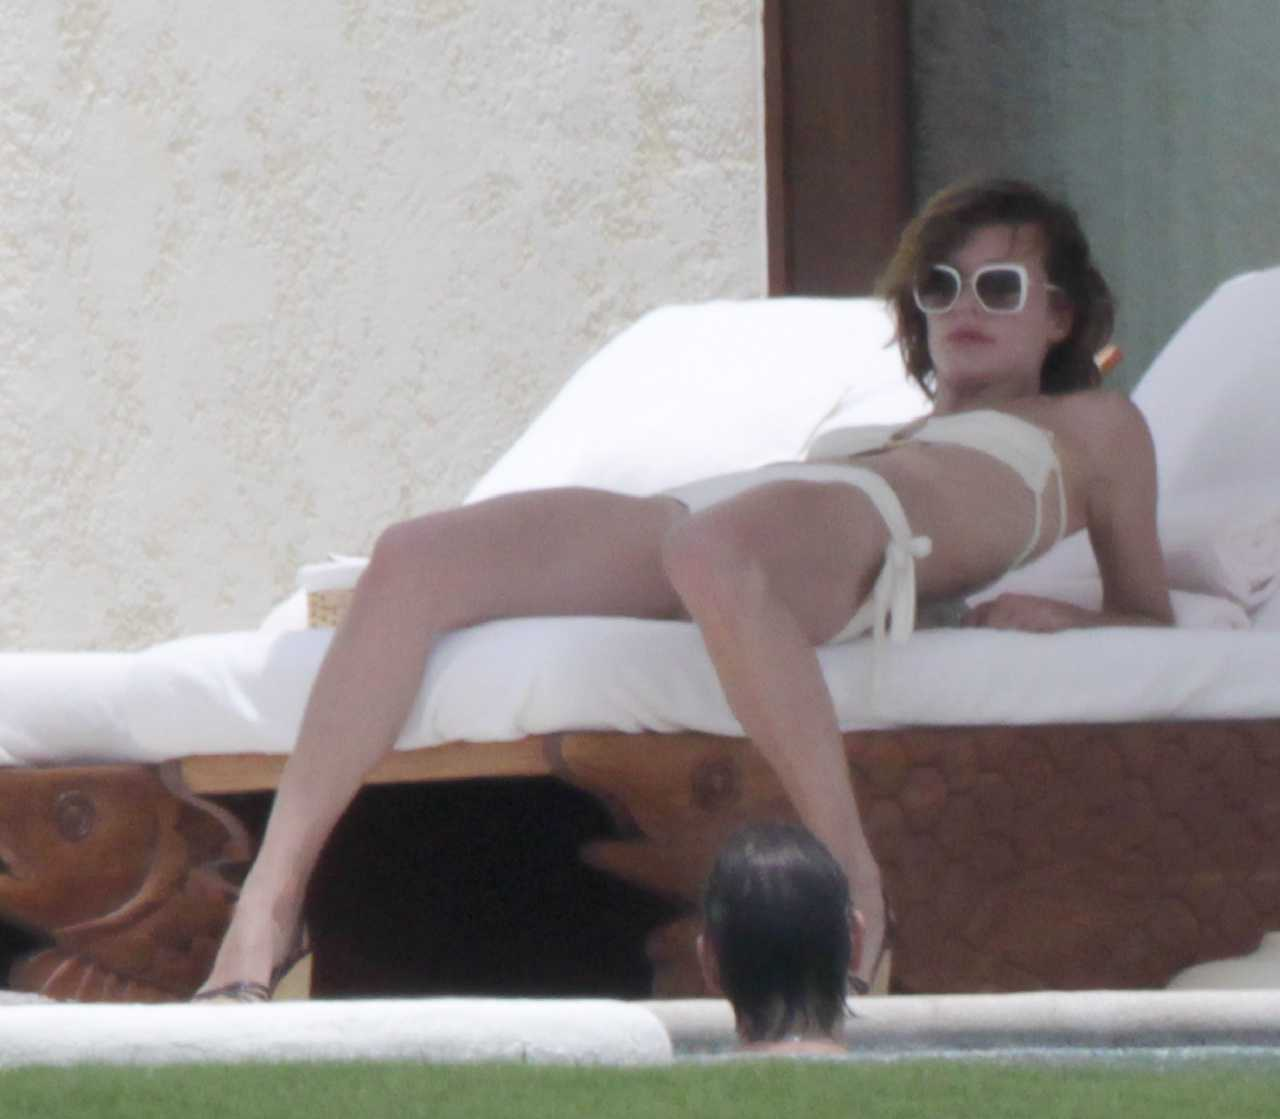 http://1.bp.blogspot.com/-NyCwSeu7BoM/TrhUXra3MGI/AAAAAAAAink/XSVNmcnIpF4/s1600/Milla+Jovovich%25E2%2580%2599s+Hottest+Bikini+and+Lingerie+Pics+08.jpg